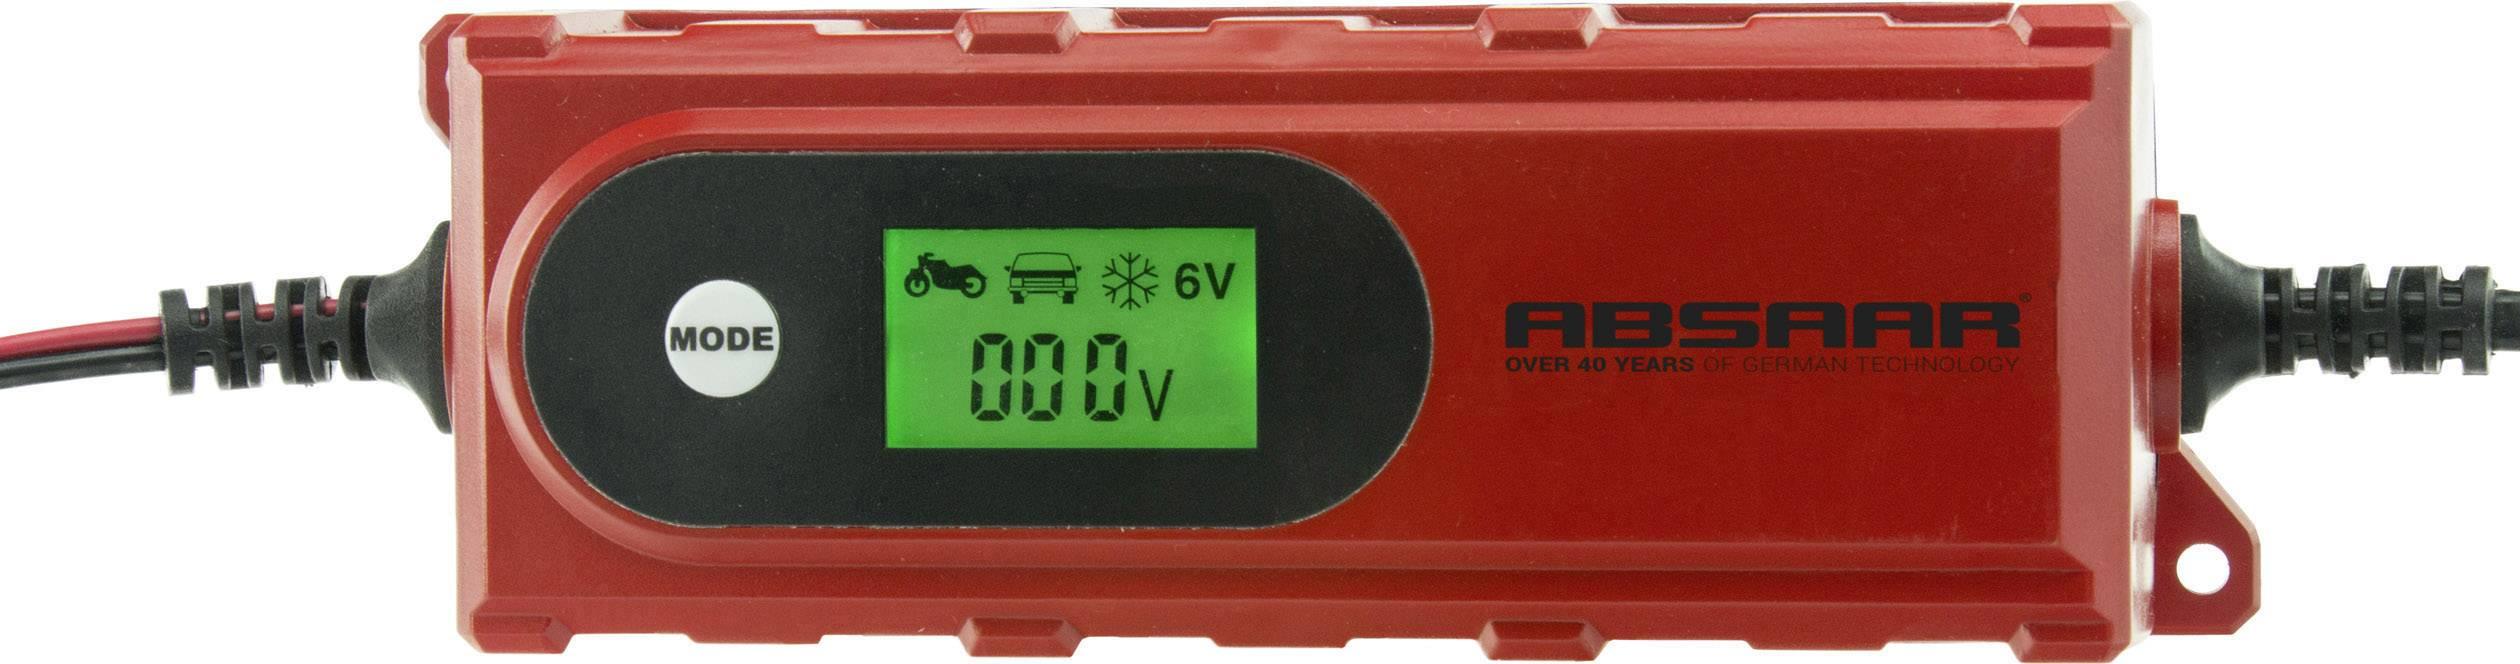 Nabíjačka autobatérie Absaar 158005, 12 V, 6 V, 2 A, 4 A